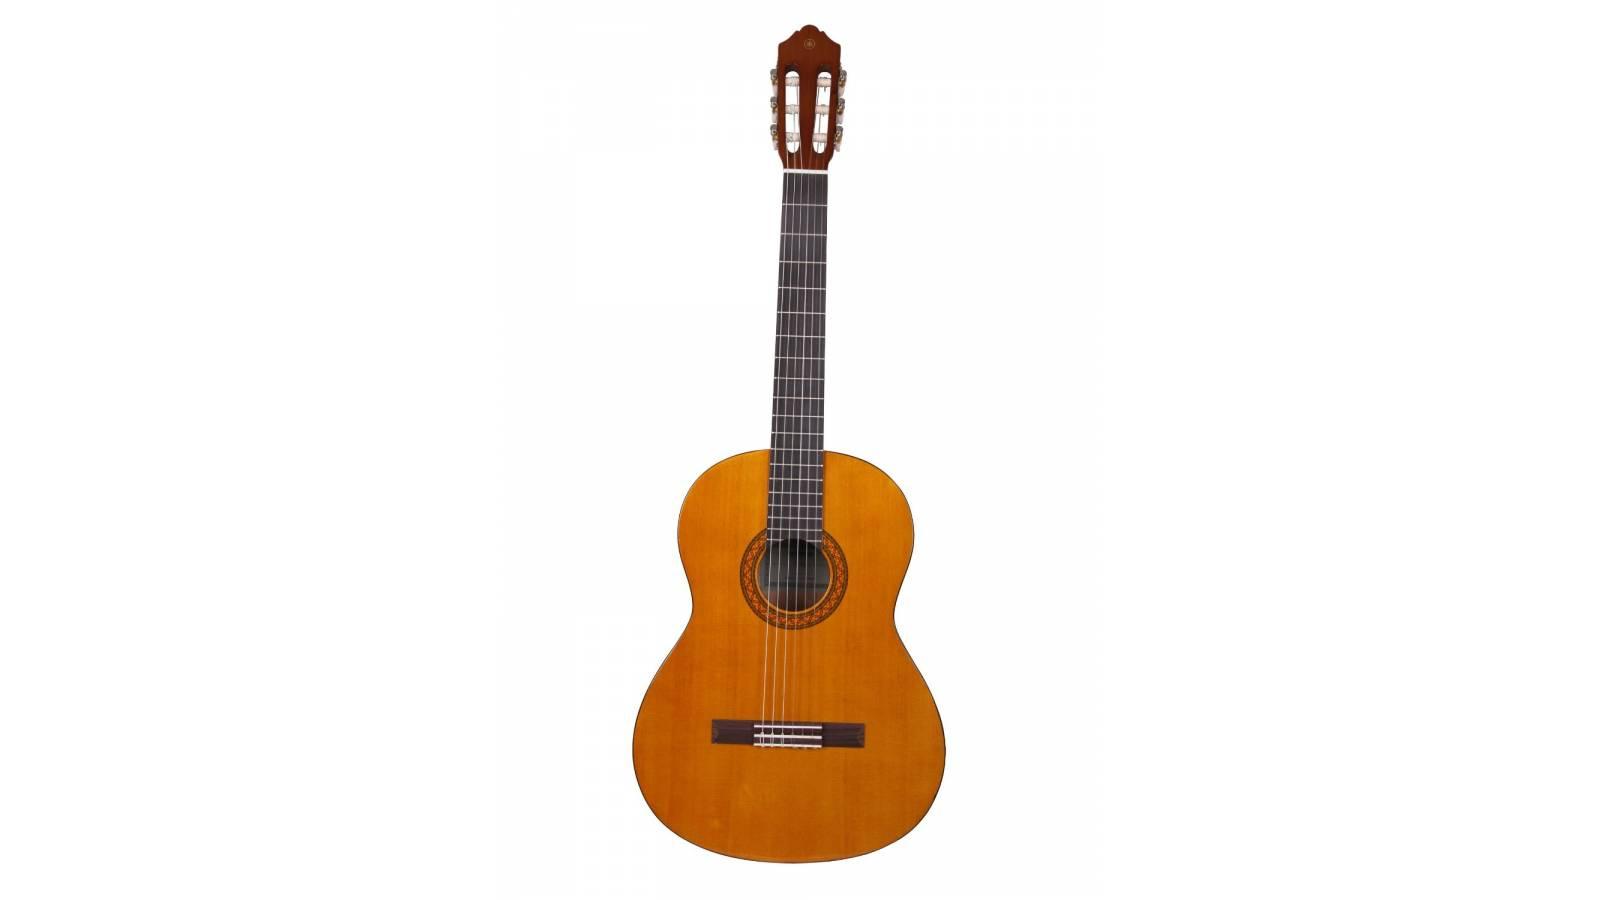 Guitarra Española (Clásica) Yamaha C-40 Excelente Sonido!